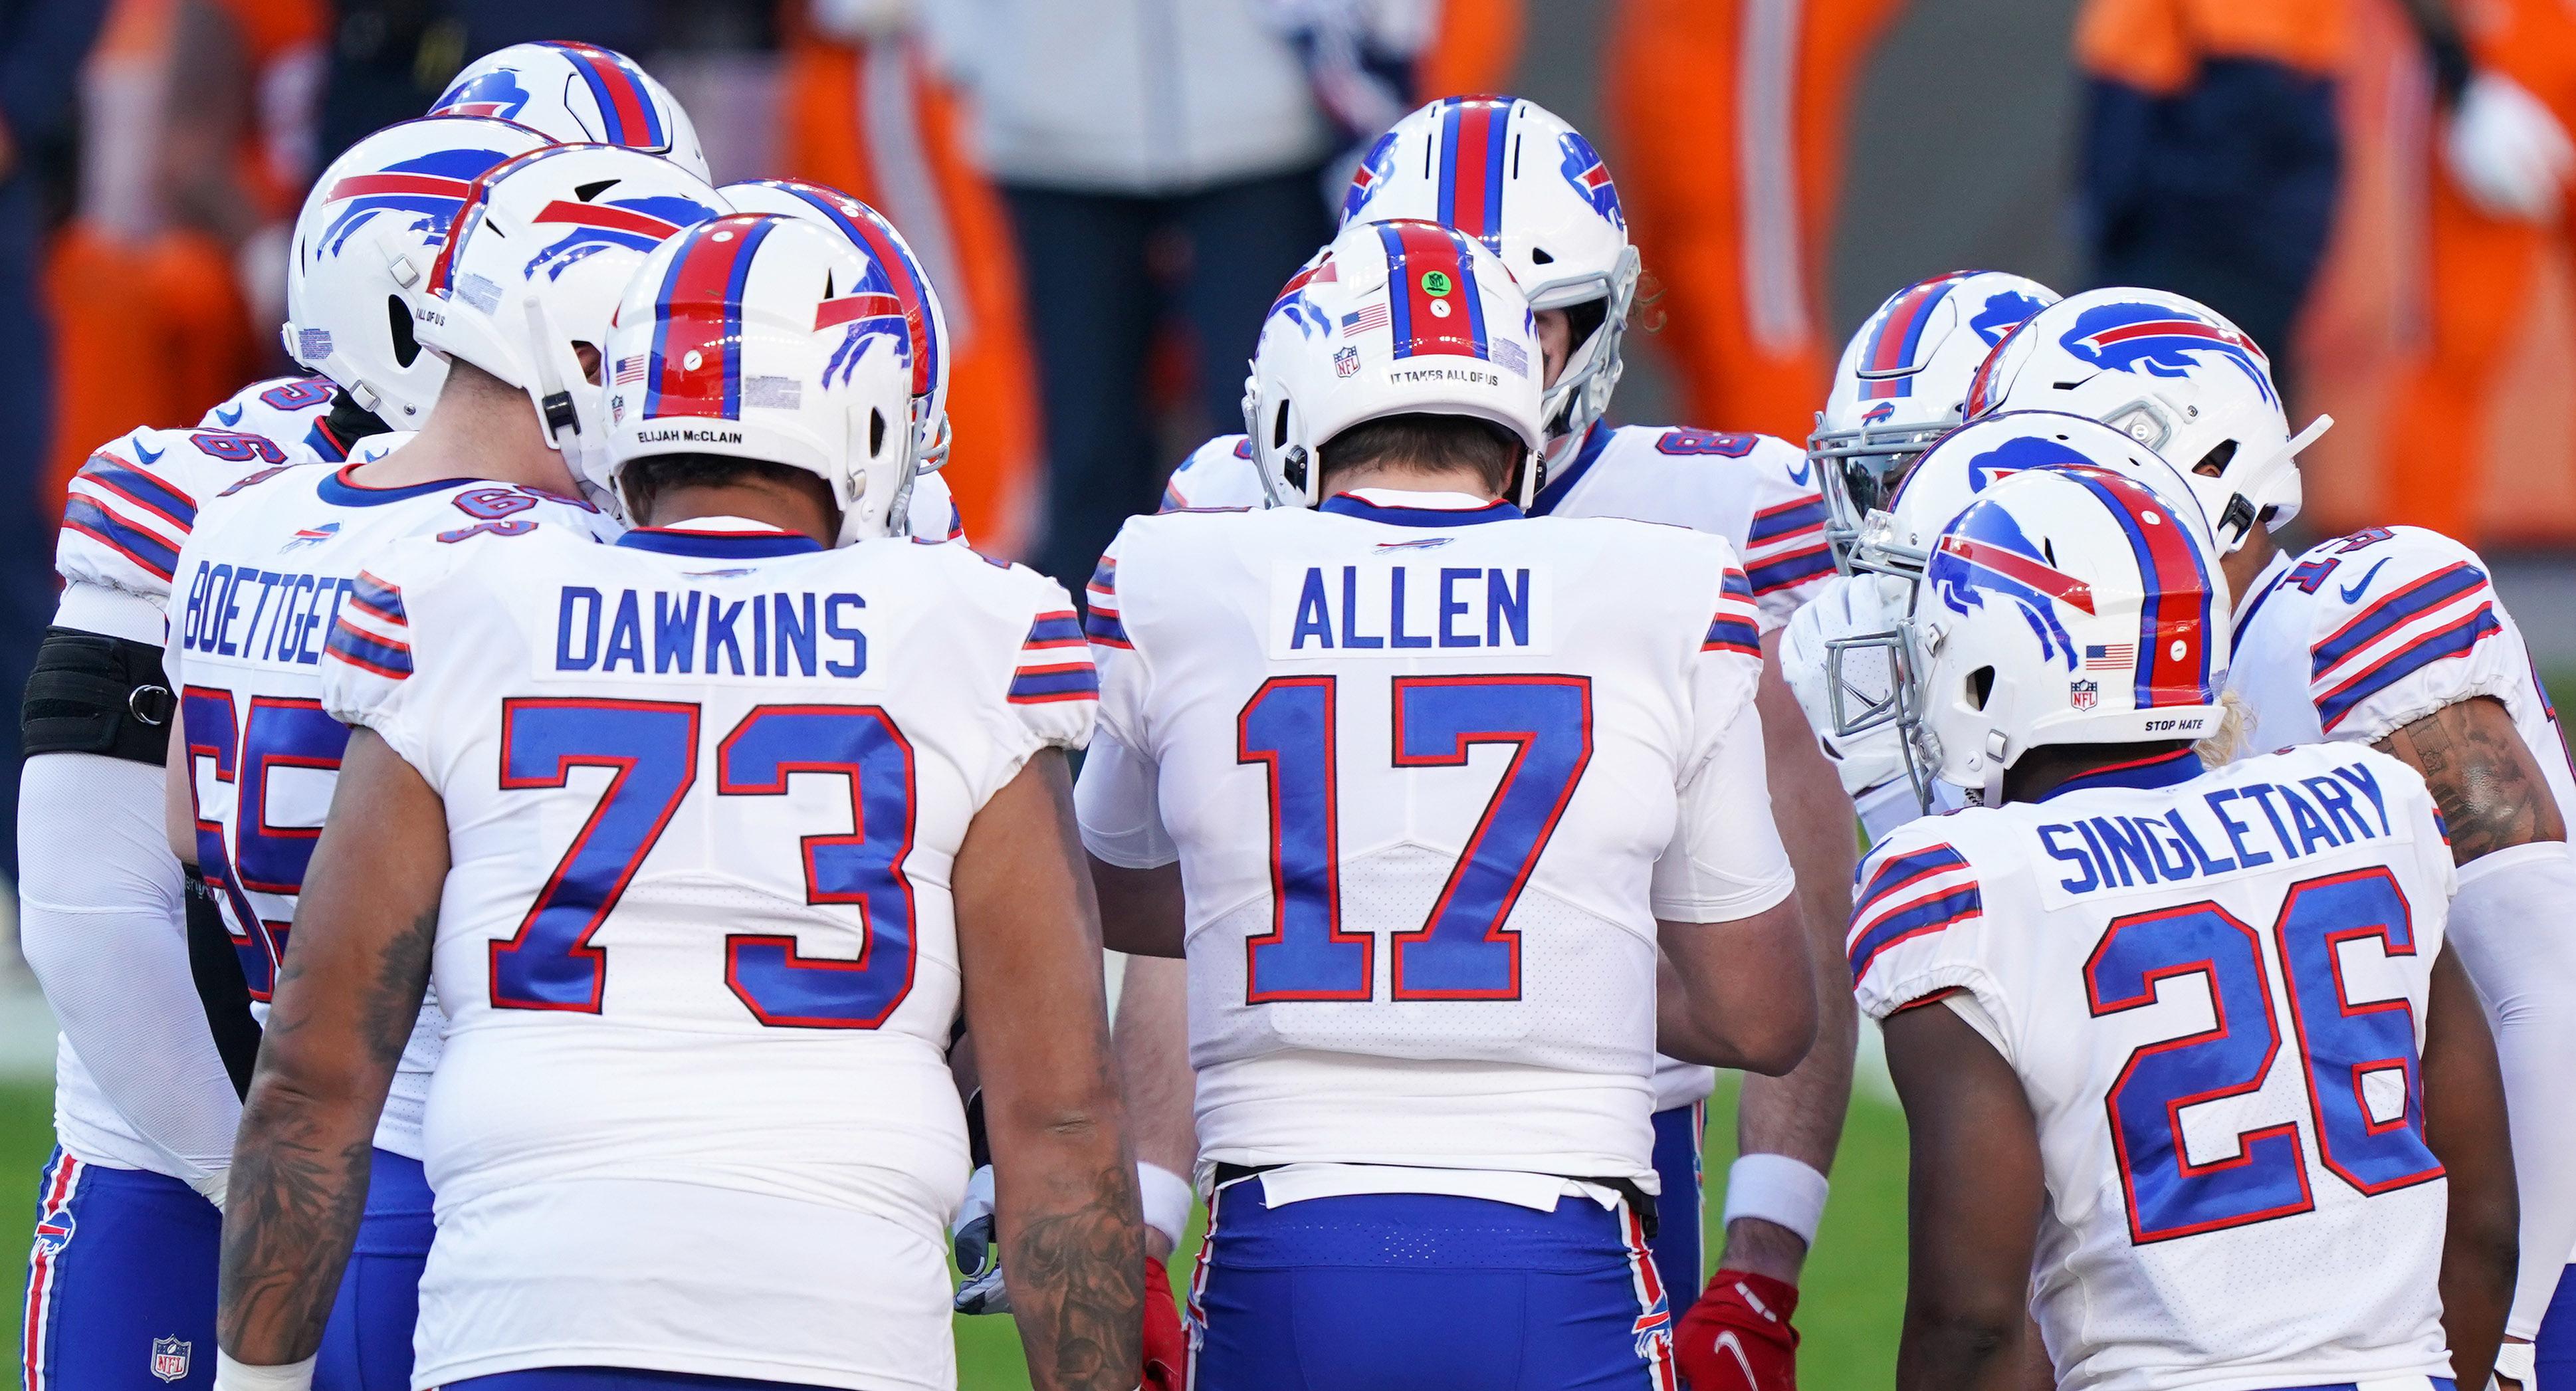 NFL: Buffalo Bills at Denver Broncos